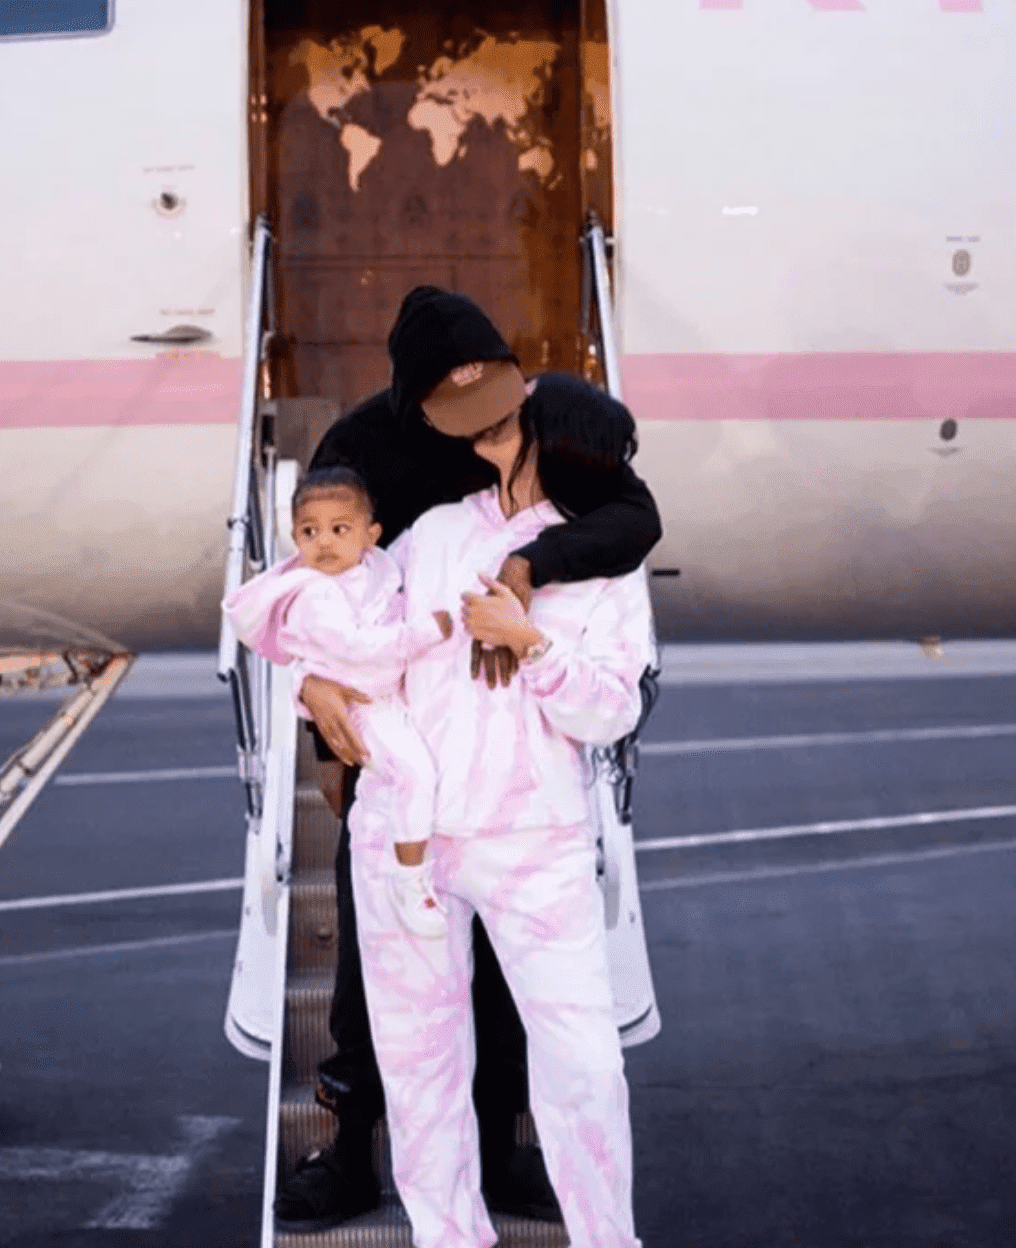 Travis Scott, Kylie Jenner and Stormi Webster. | Source: Instagram/kyliejenner